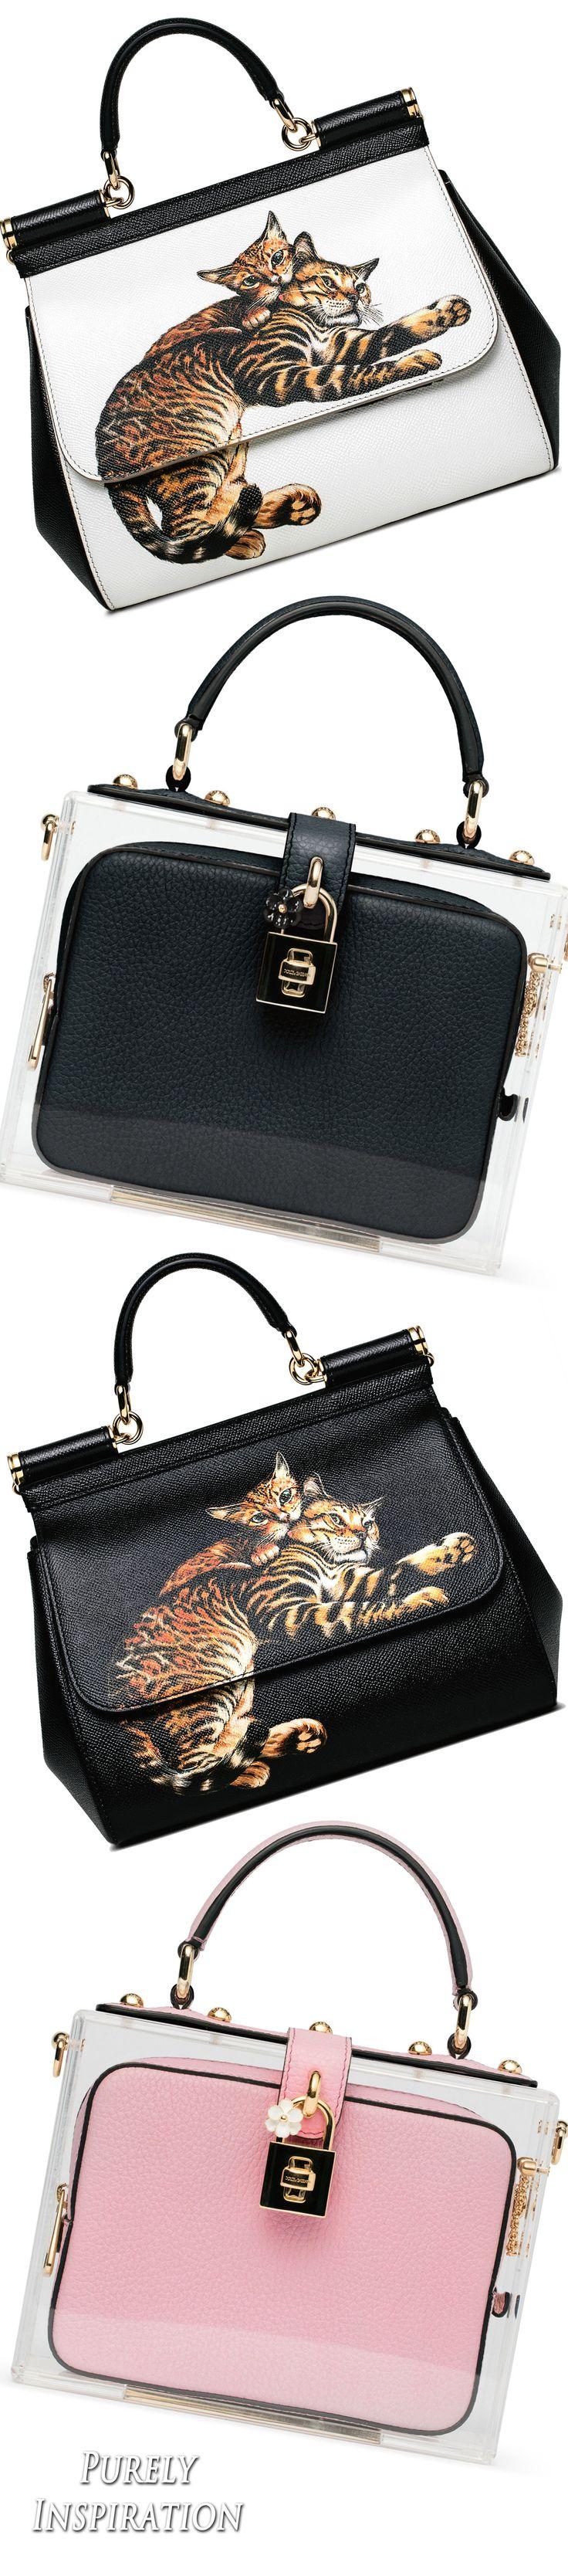 Dolce & Gabbana FW2016   Purely Inspiration   @ my handbags